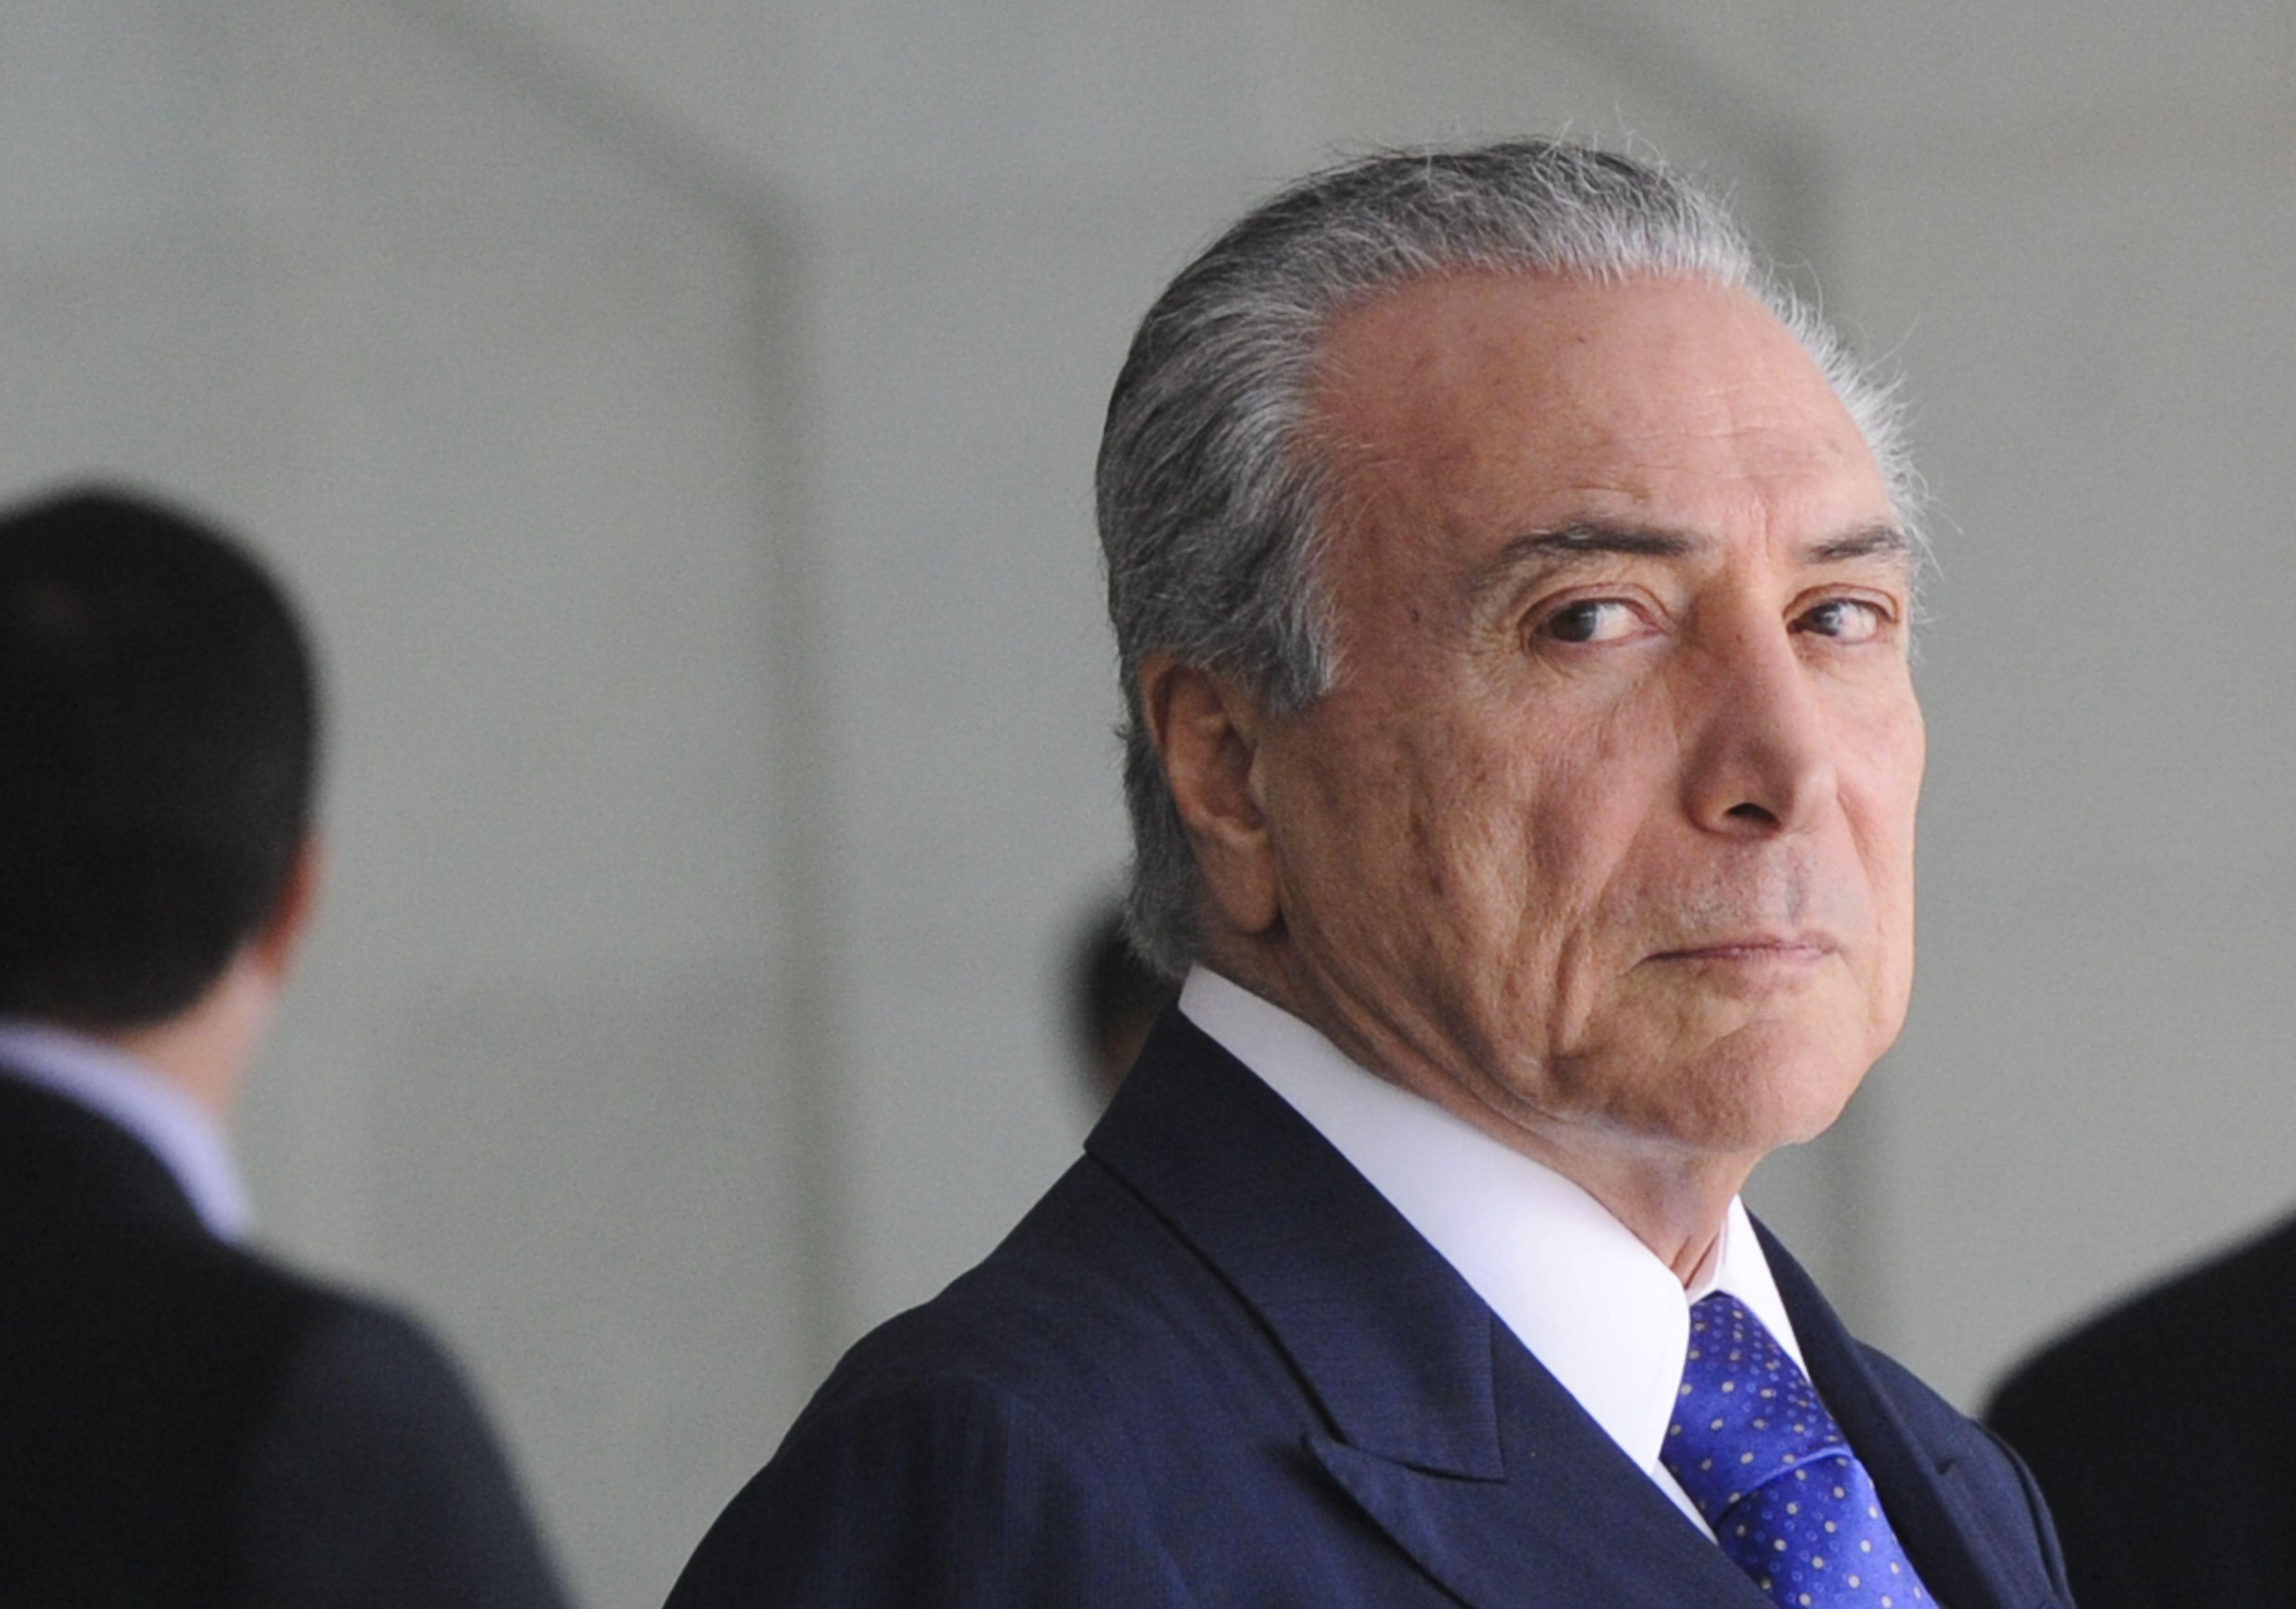 Michel Temer viu seu governo passar por grave crise política (Foto: Agência Brasil)